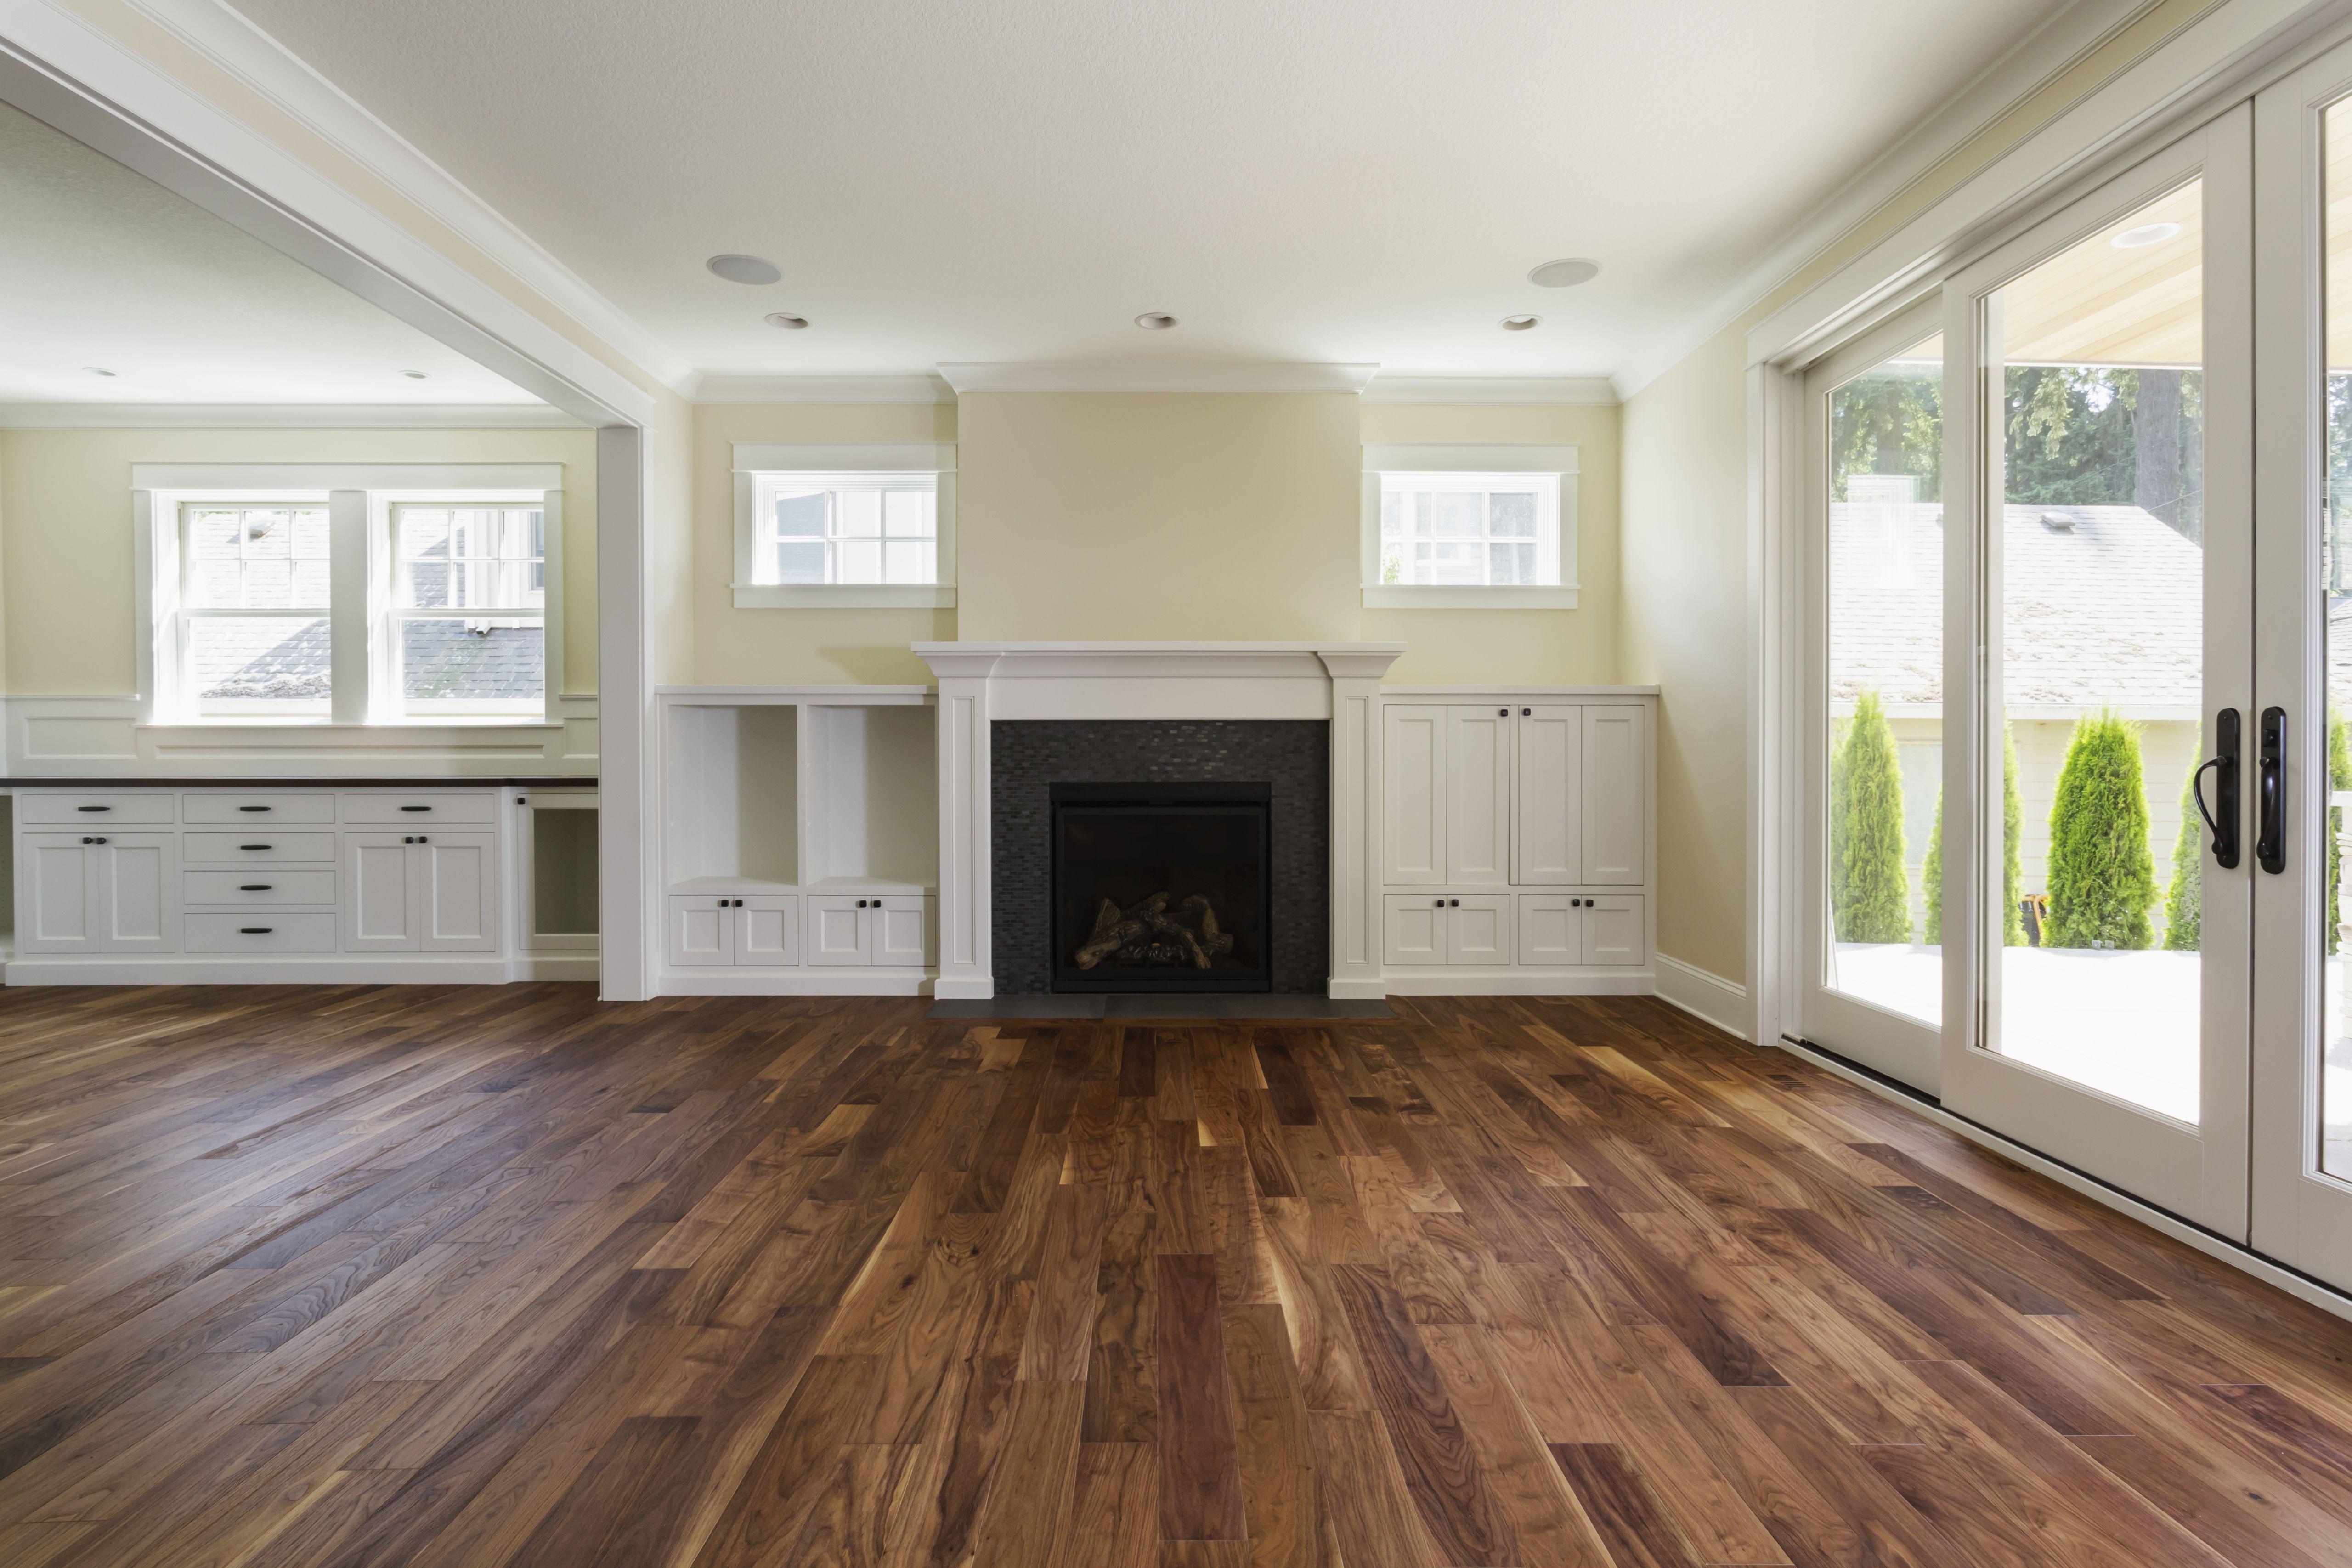 hardwood flooring st louis of hardwood floors vs carpet floor in hardwood floors vs carpet the pros and cons of prefinished hardwood flooring